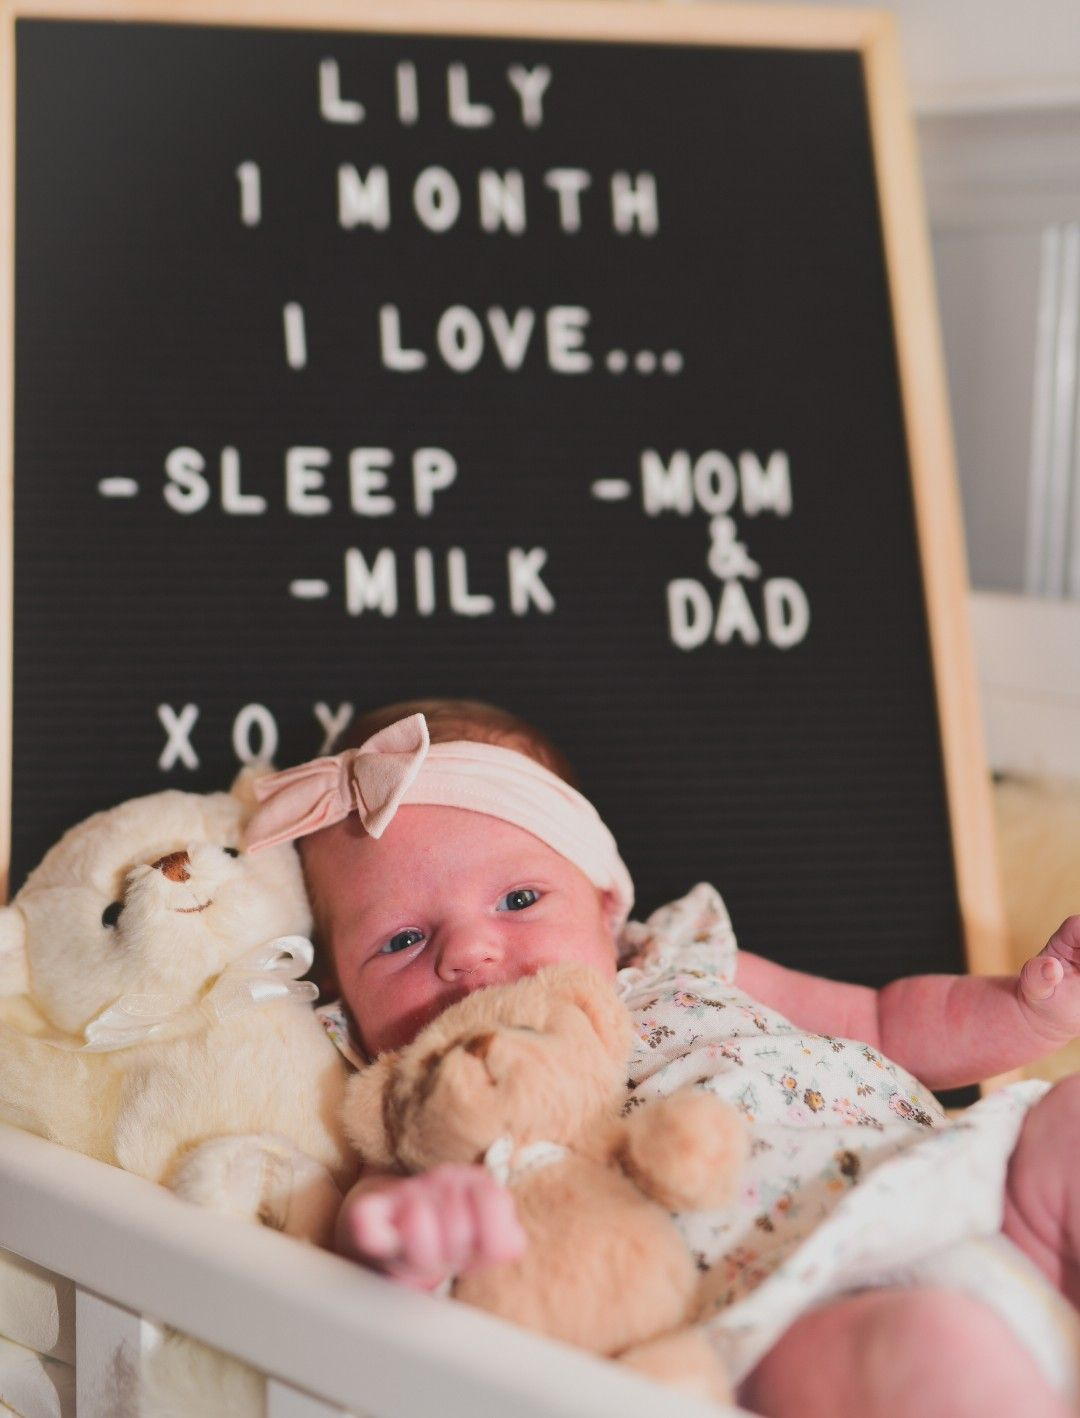 Bebis Baby Manadsbild 1manad 1month Love Bebisbilder Babypictures Baby Milestone Photos Baby Month By Month Monthly Baby Pictures